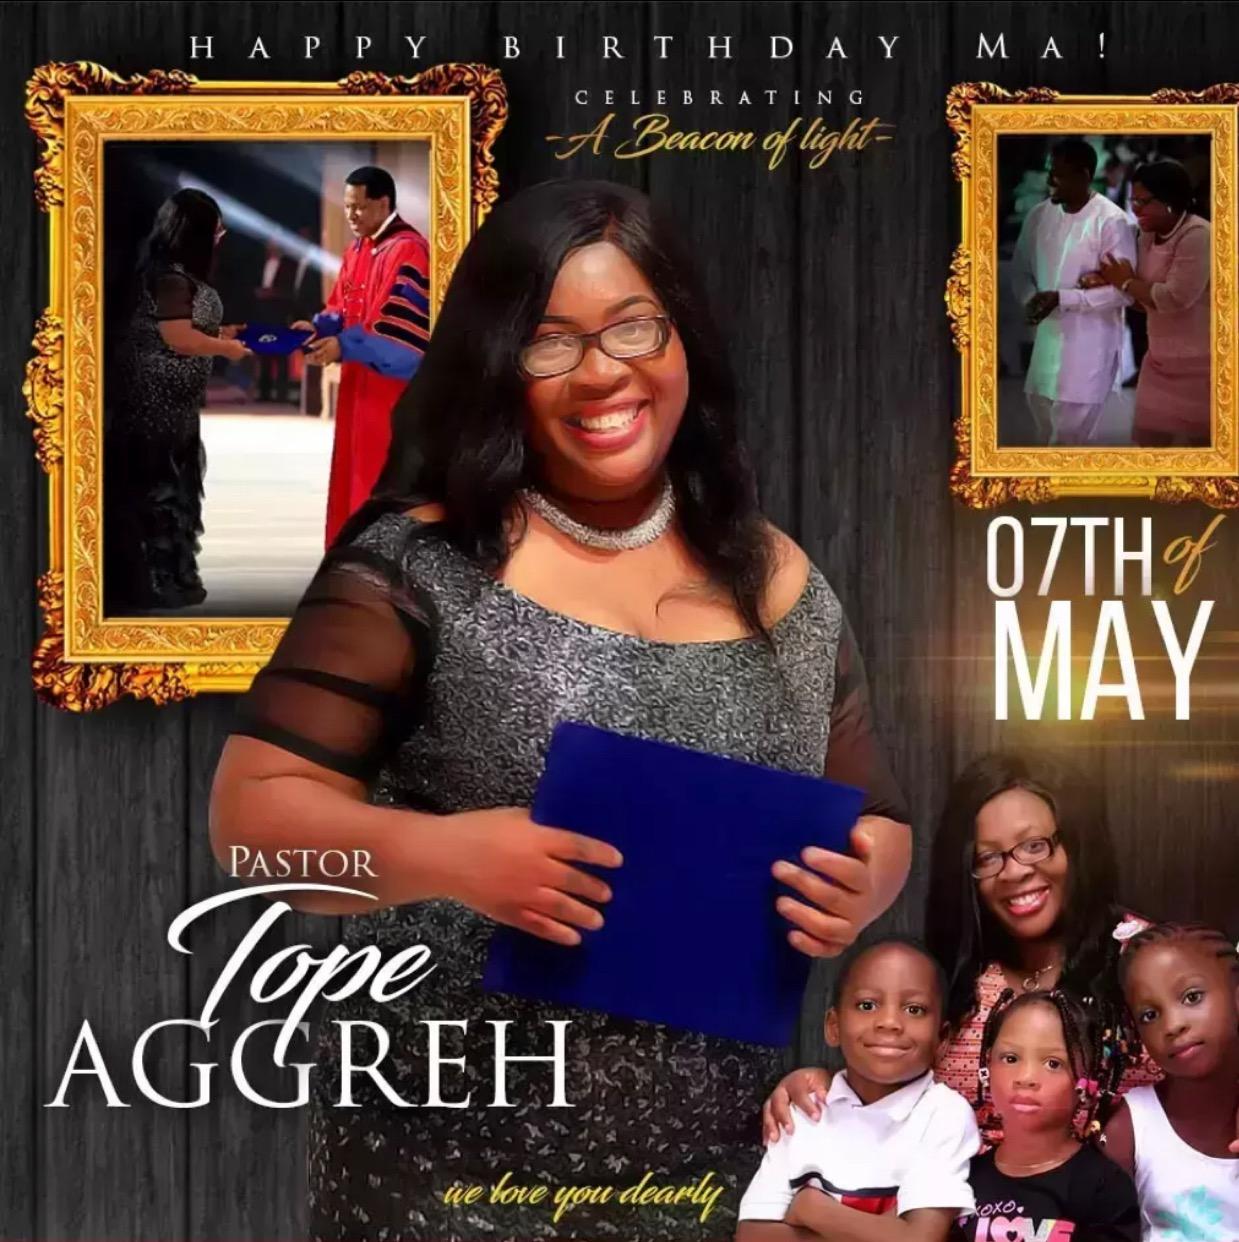 Definitely still celebrating Pastor Tope,